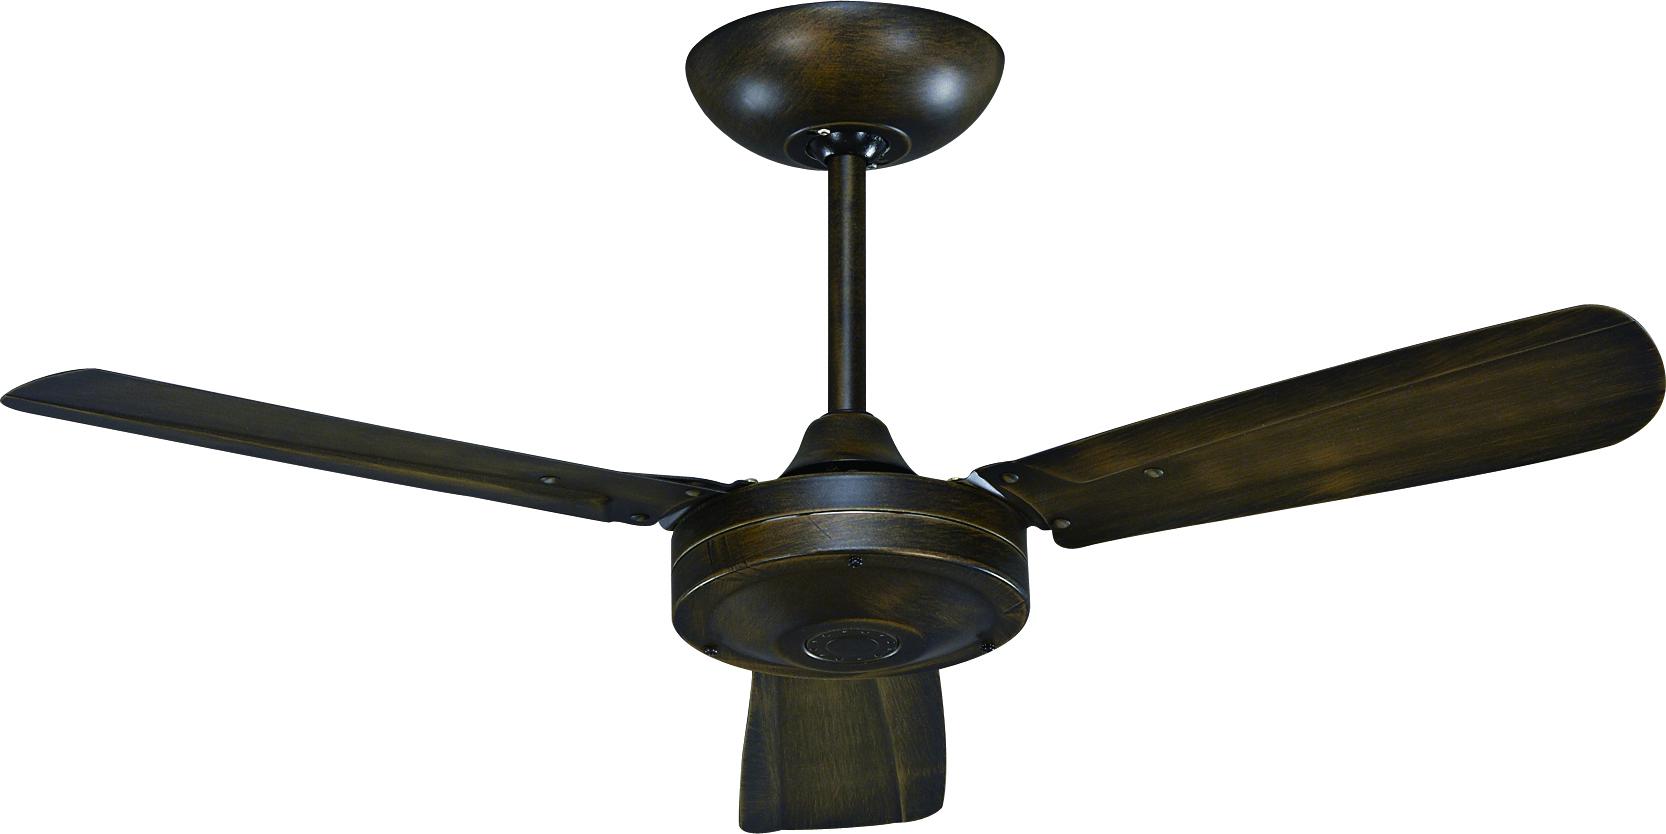 15439【Iron Leaf Fan】Pseudo Antique